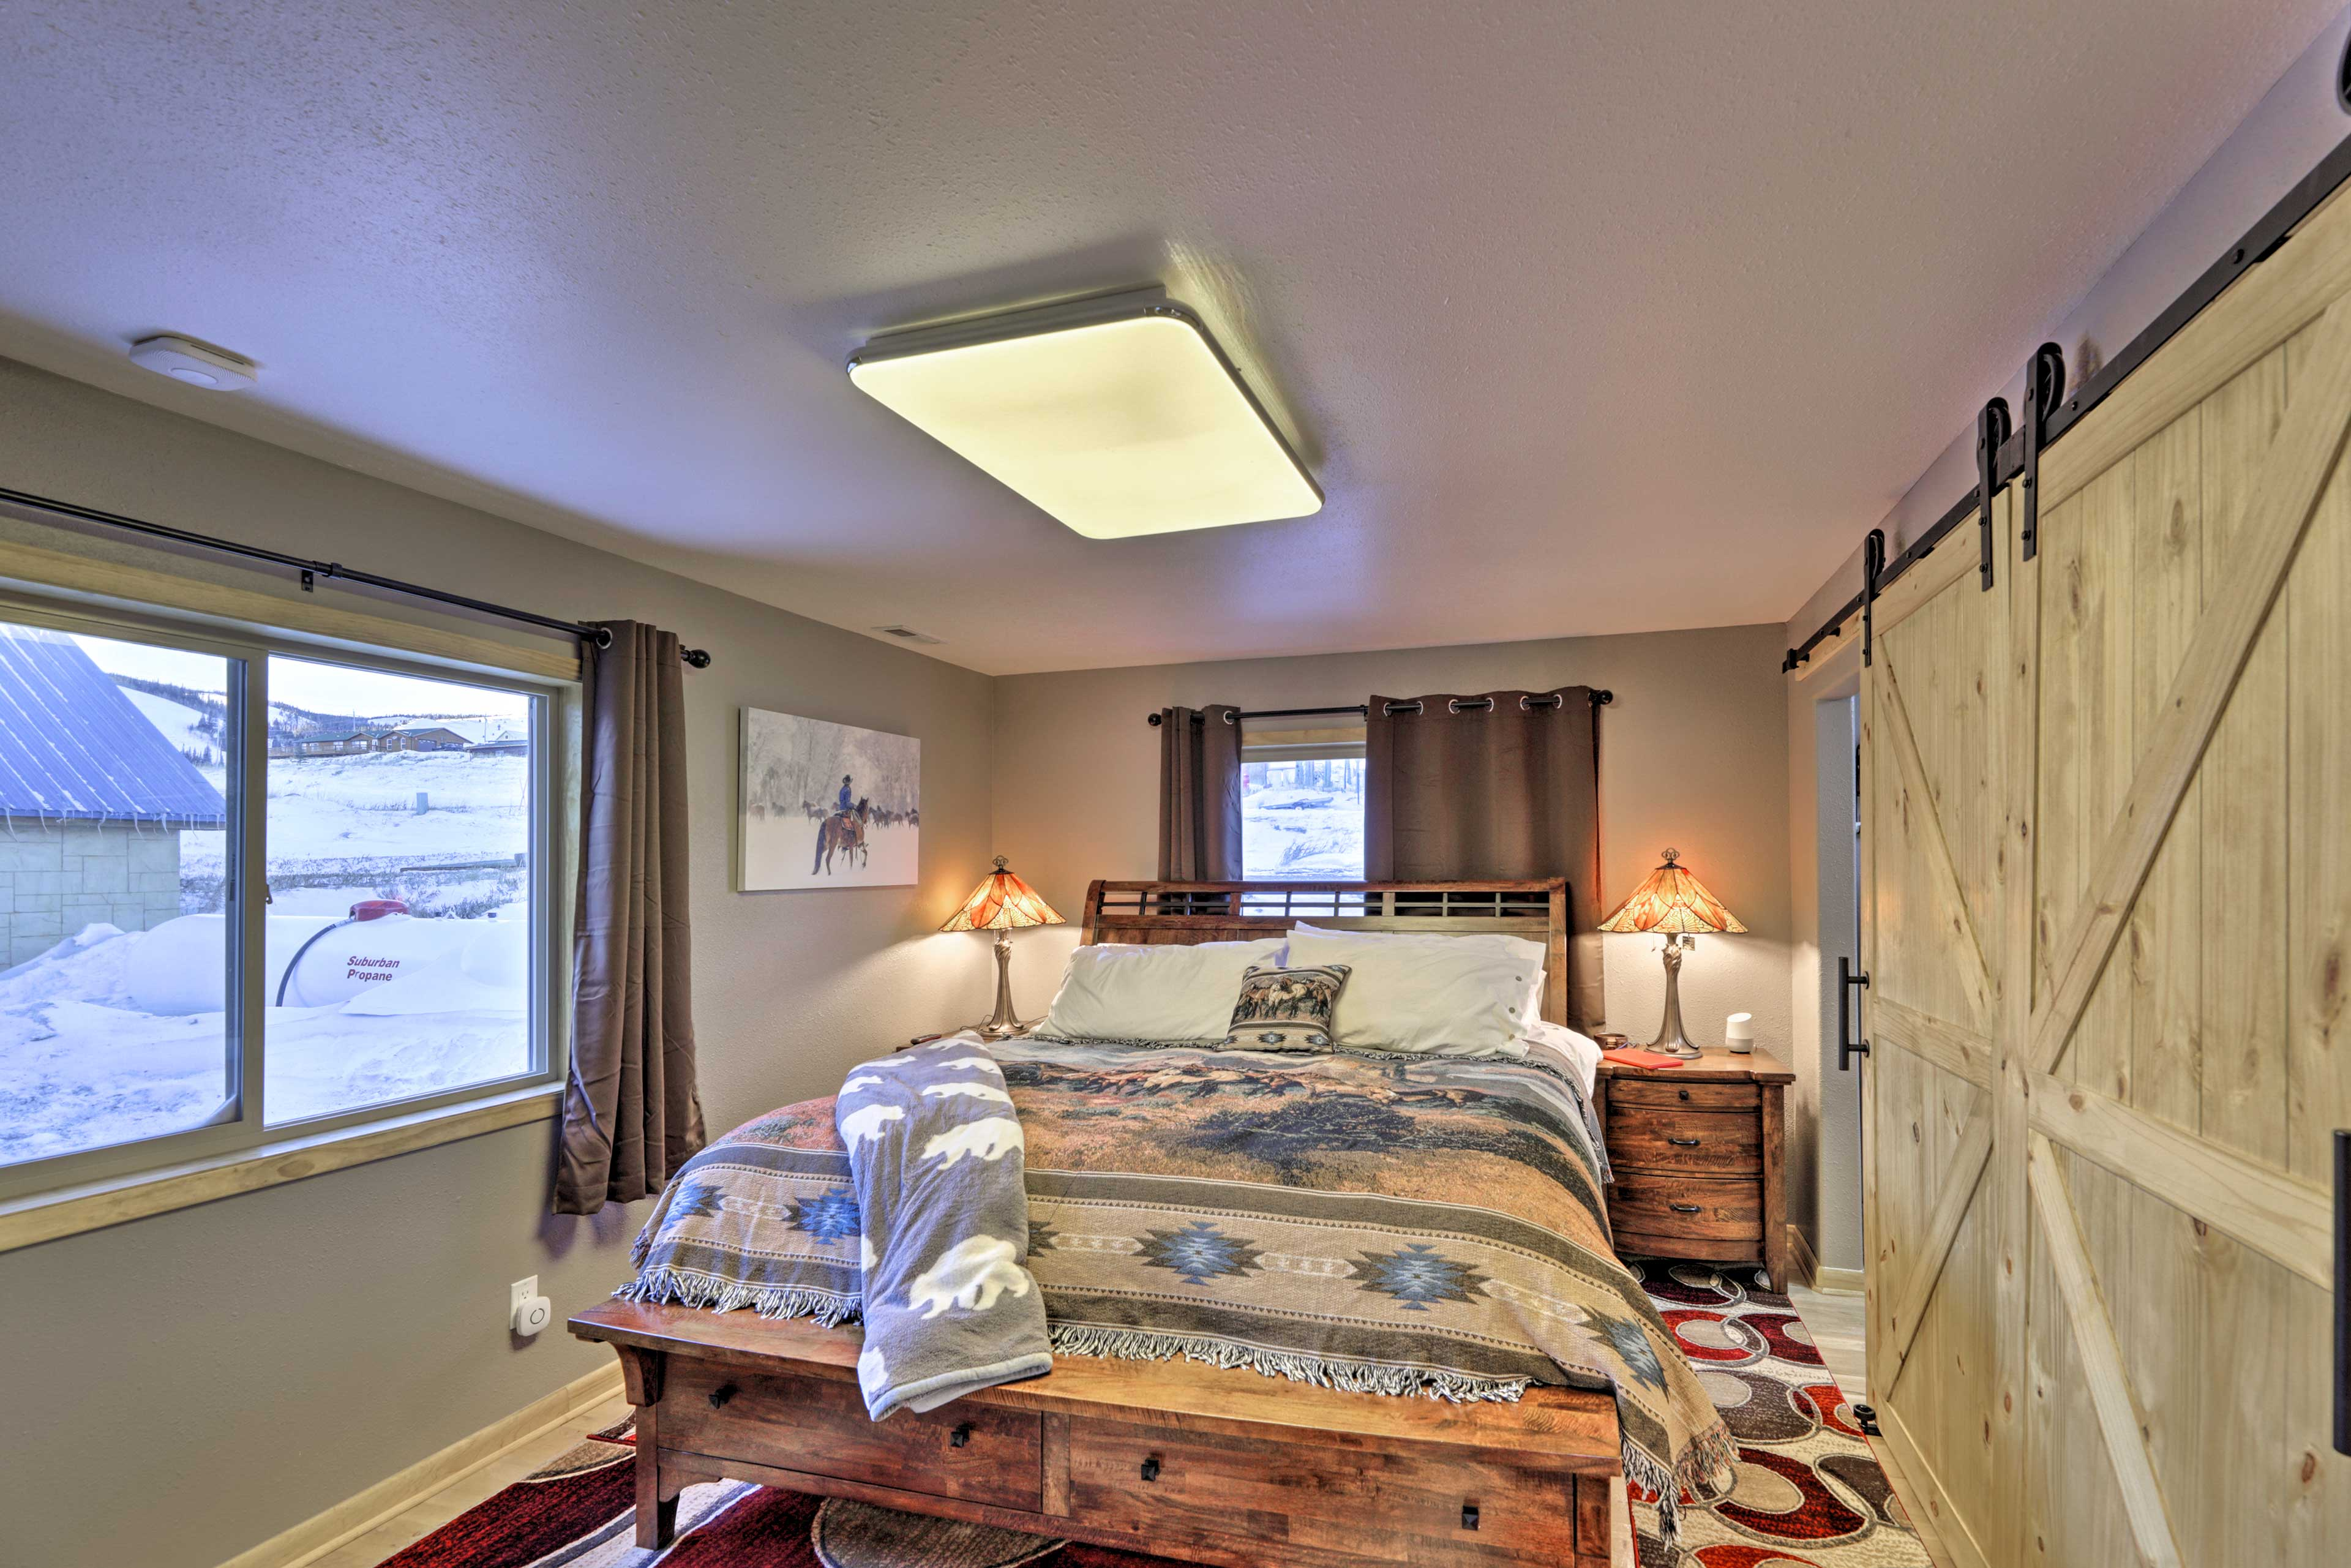 Sliding barn doors open up to the master bedroom.